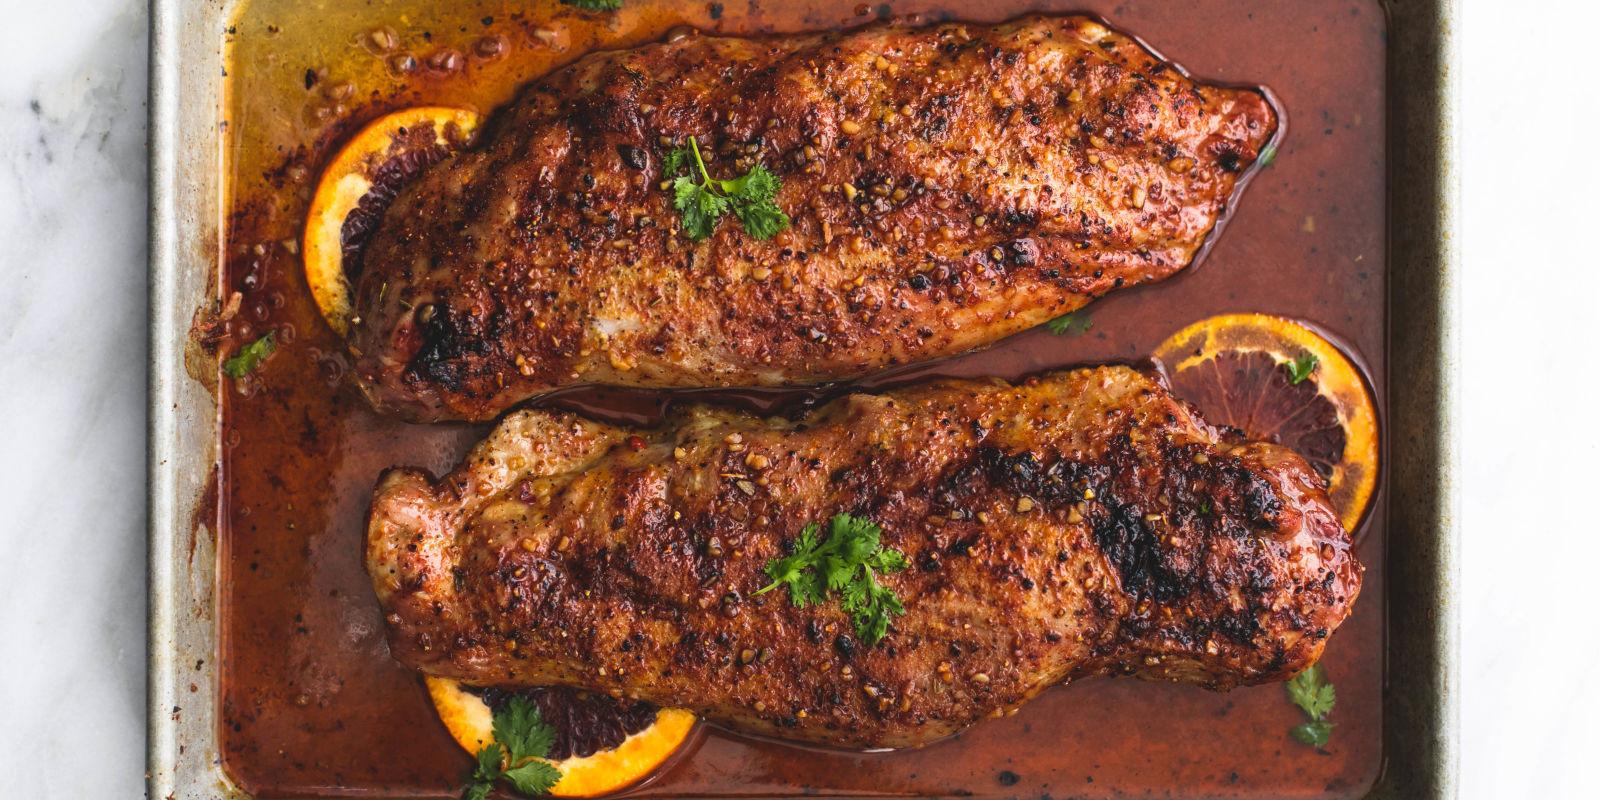 Cooking Time For Pork Loin  Best Glazed Pork Tenderloin Recipe How To Cook Pork